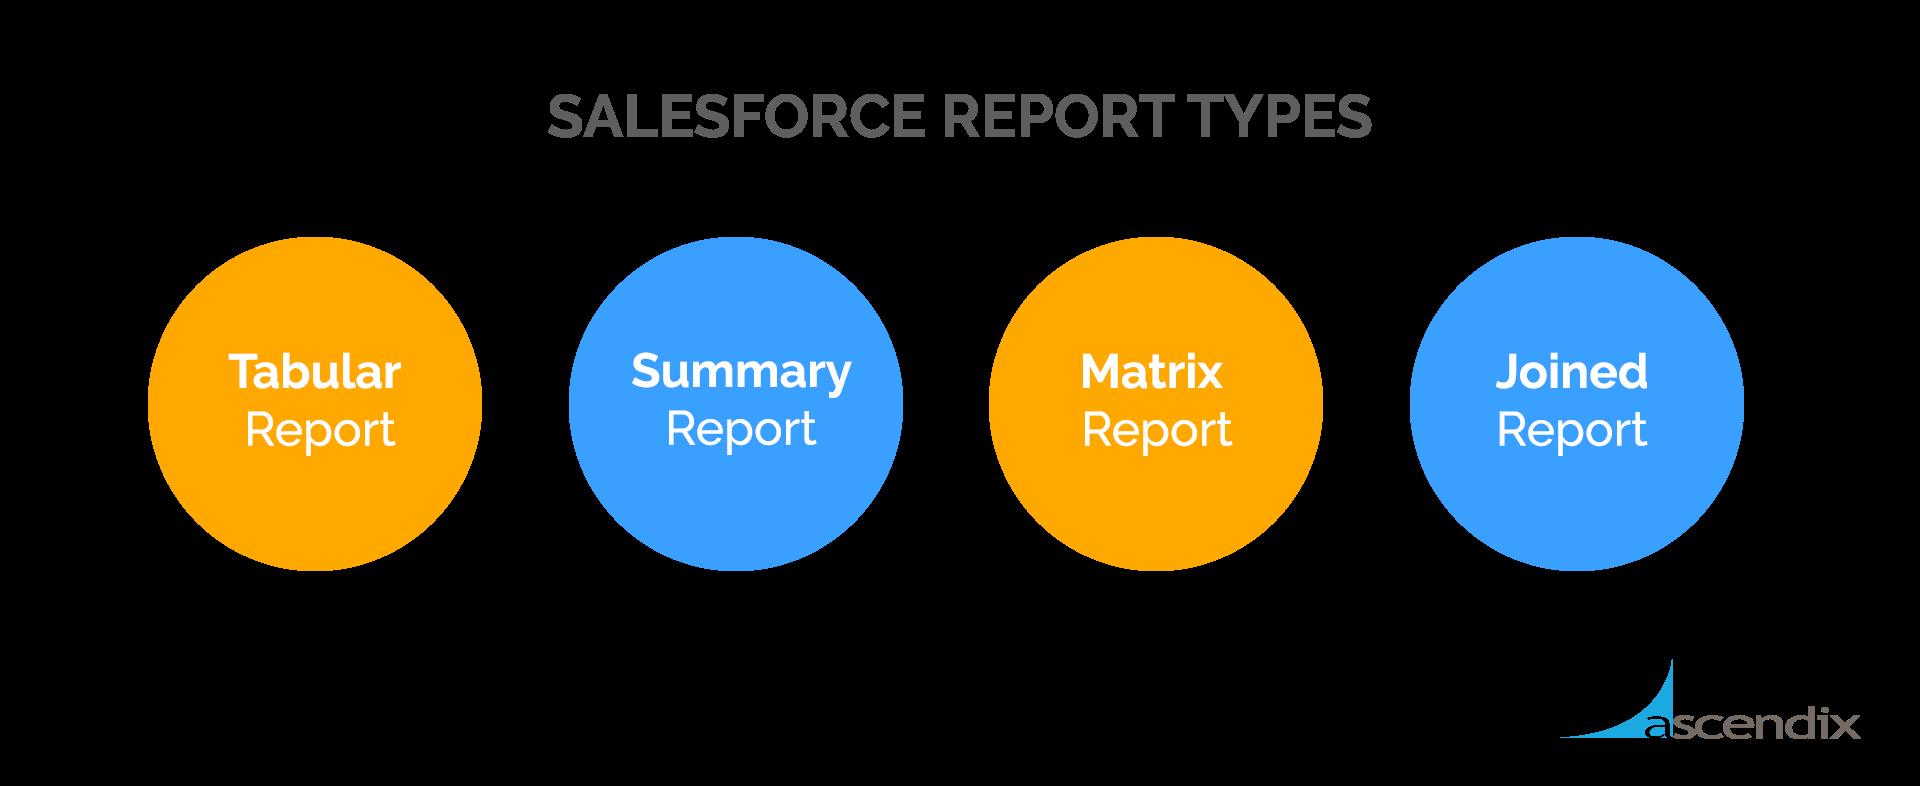 Salesforce Report Types